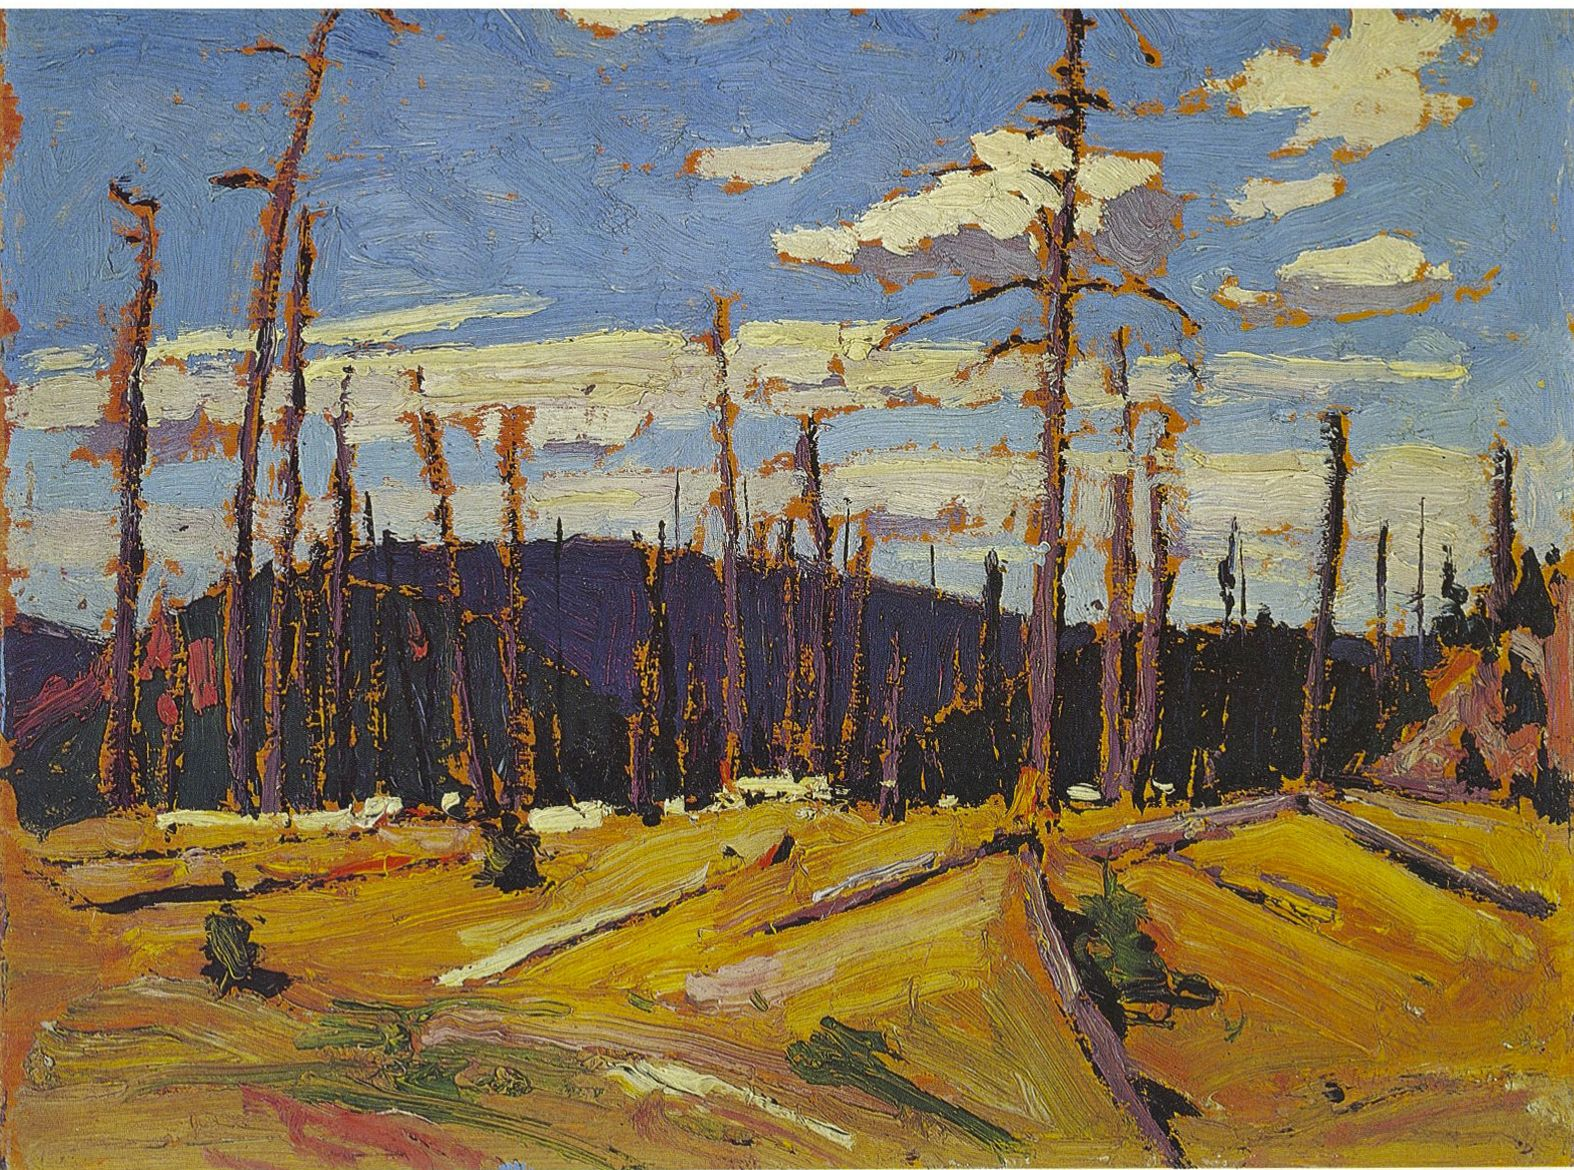 Tom Thomson Catalogue Raisonné   Burnt-Over Forest, Spring 1916 (1916.40)   Catalogue entry